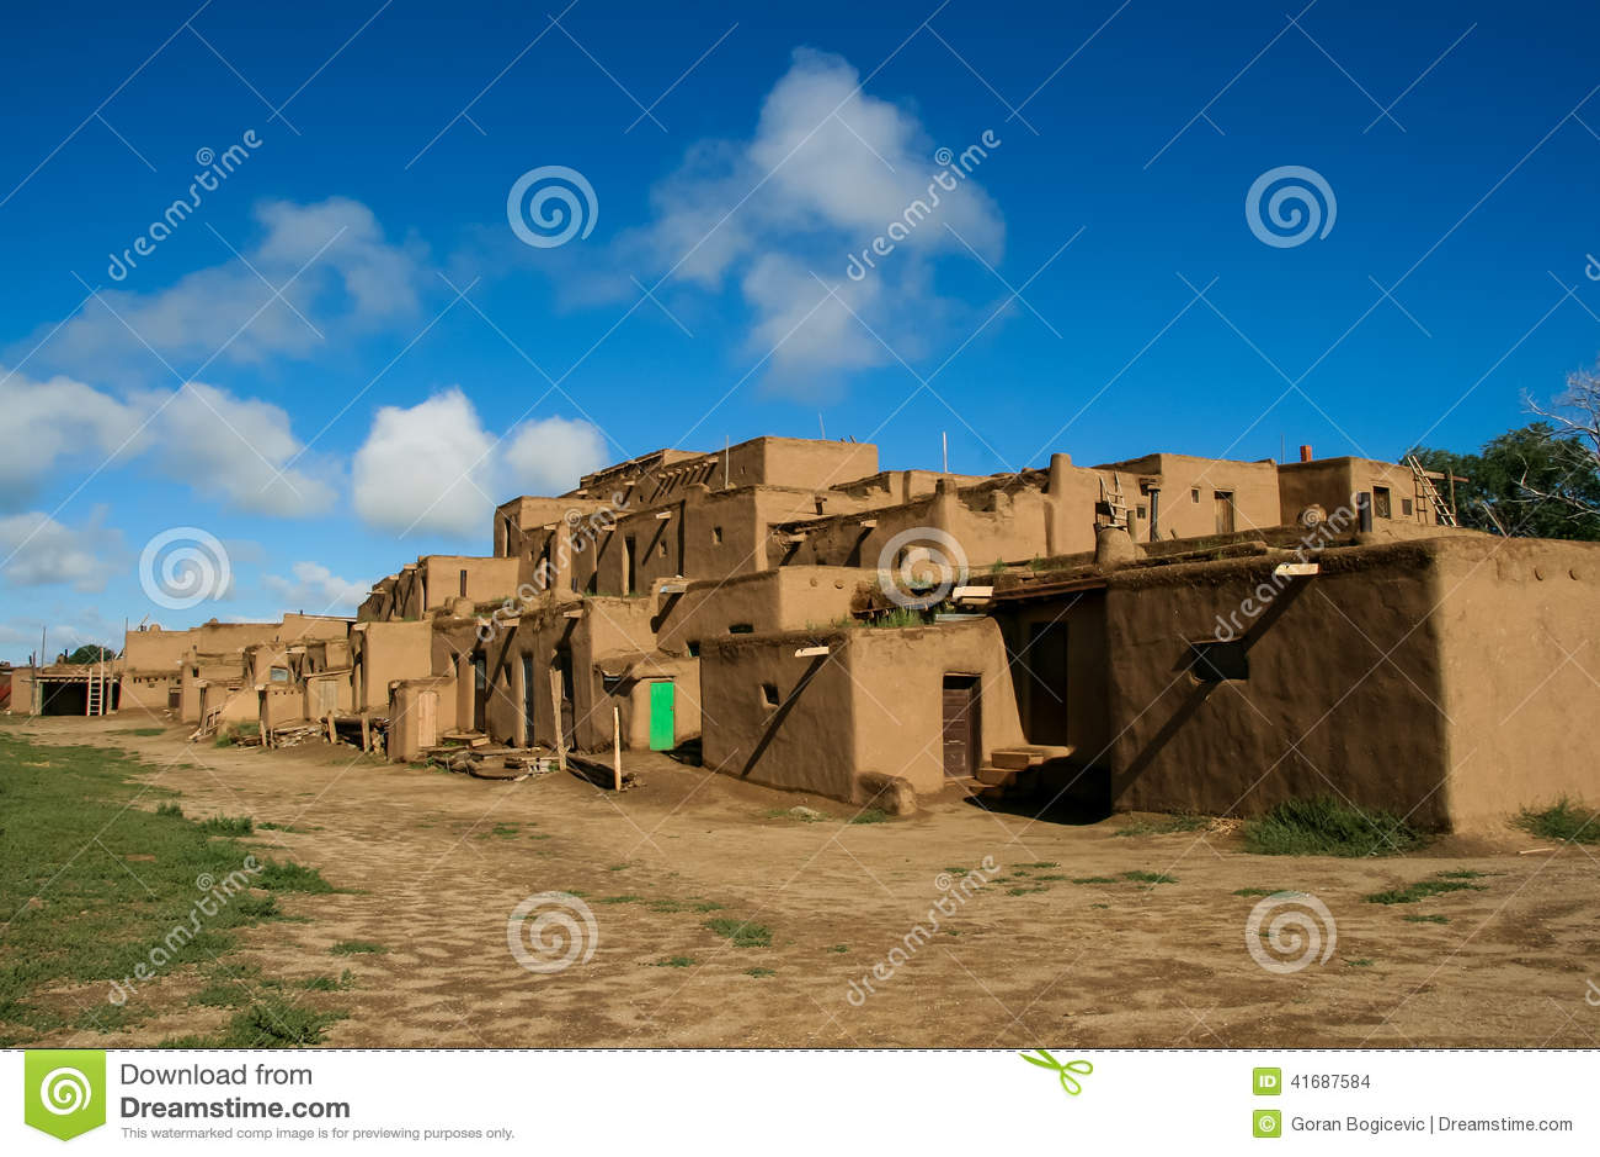 Taos Pueblo, Taos, New Mexico - on a cloudy day for very ...  |Taos Pueblo New Mexico Usa